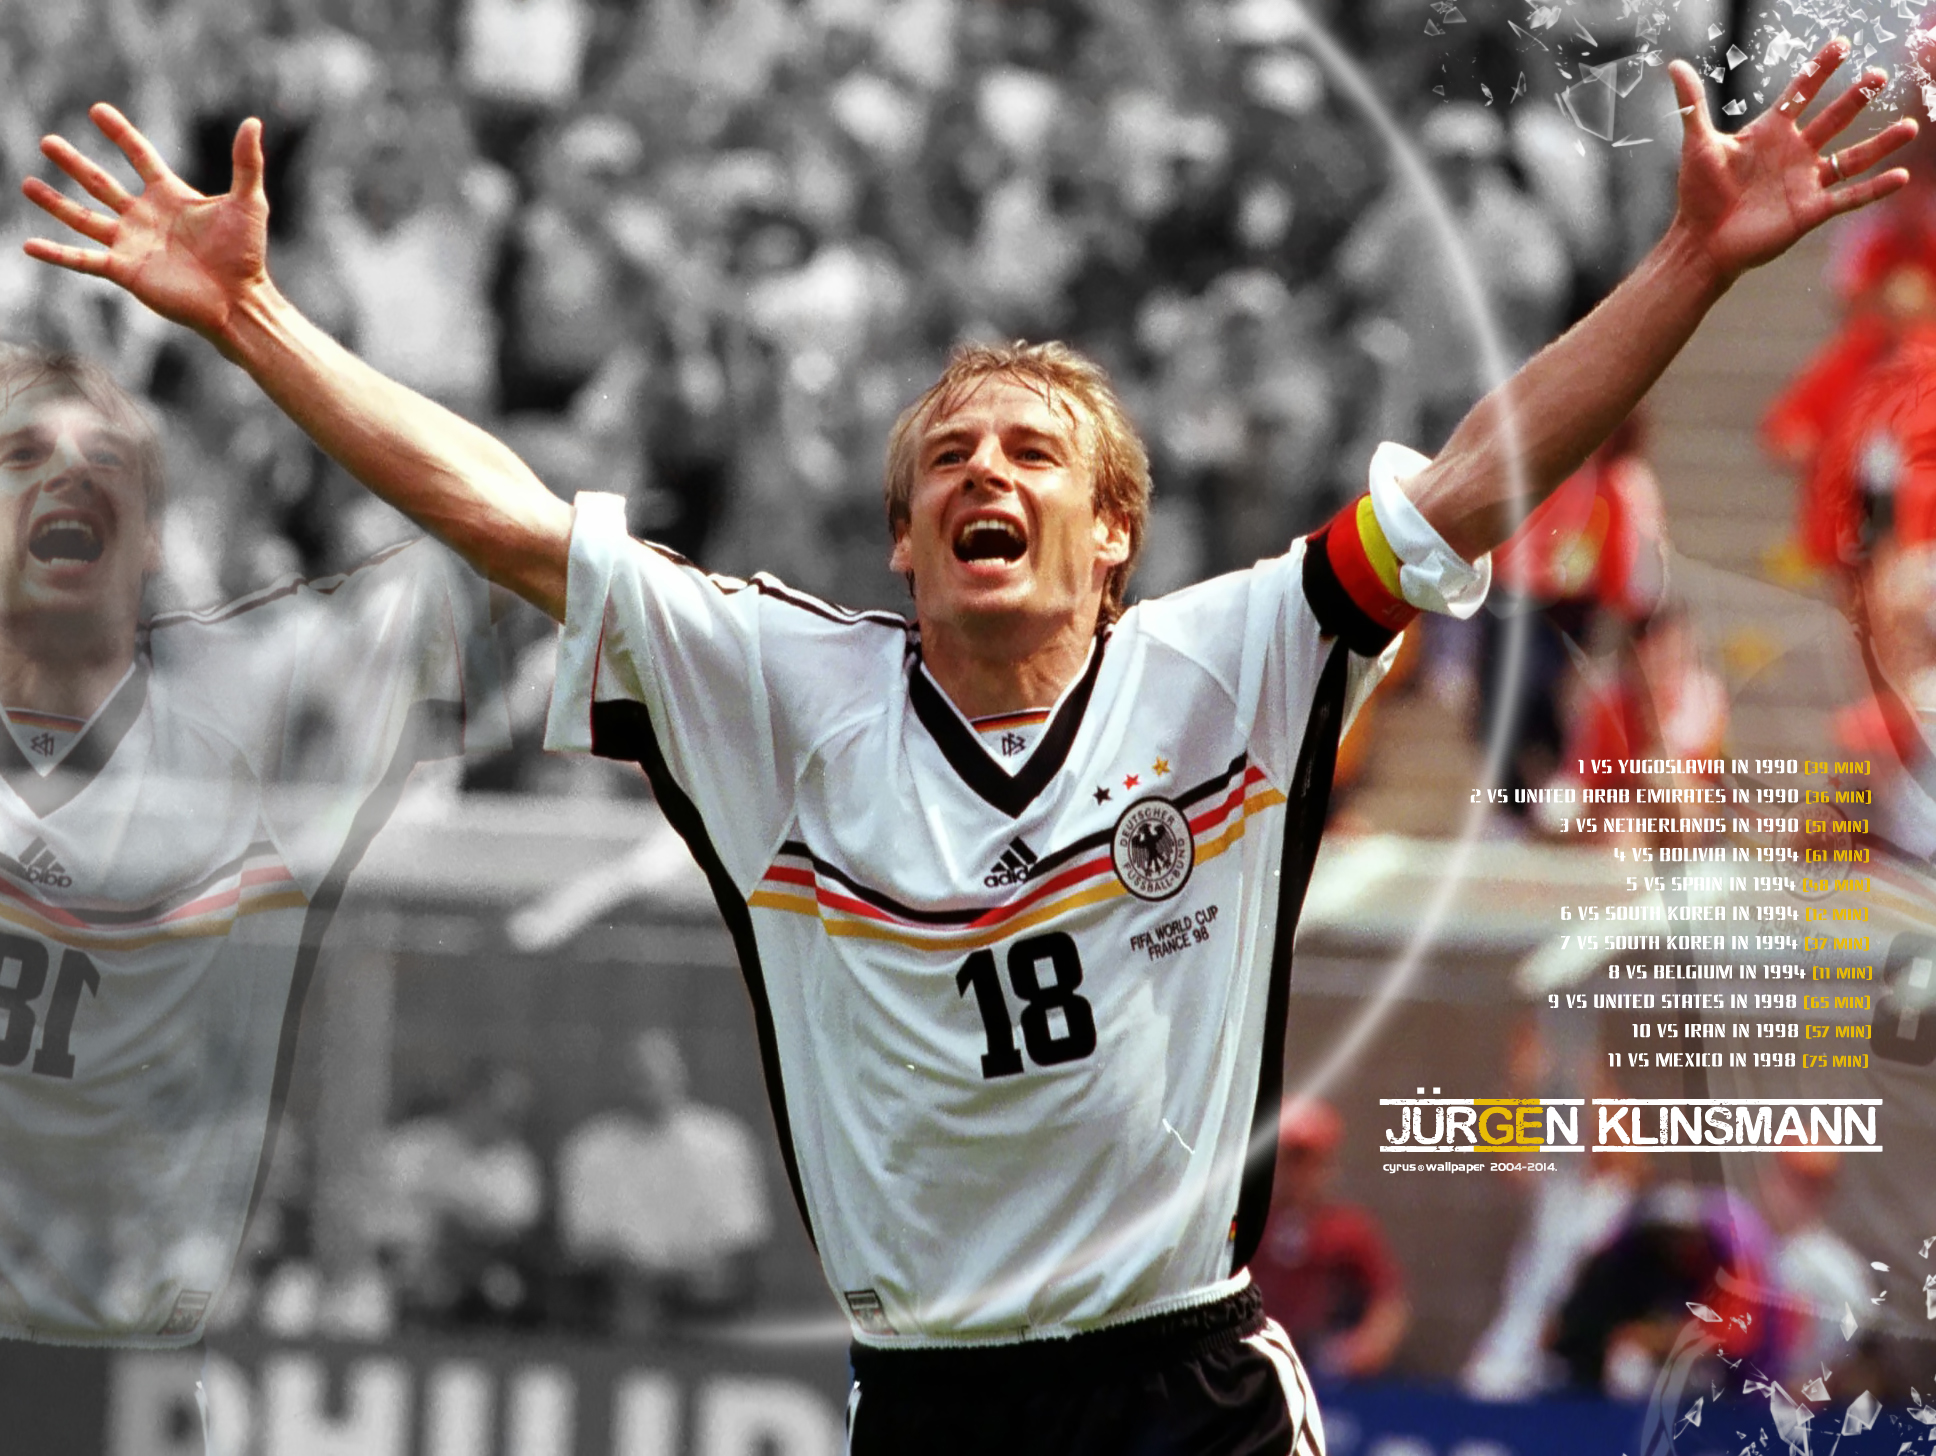 والپیپر یورگن کلینزمن بمب افکن آلمان در جام جهانی